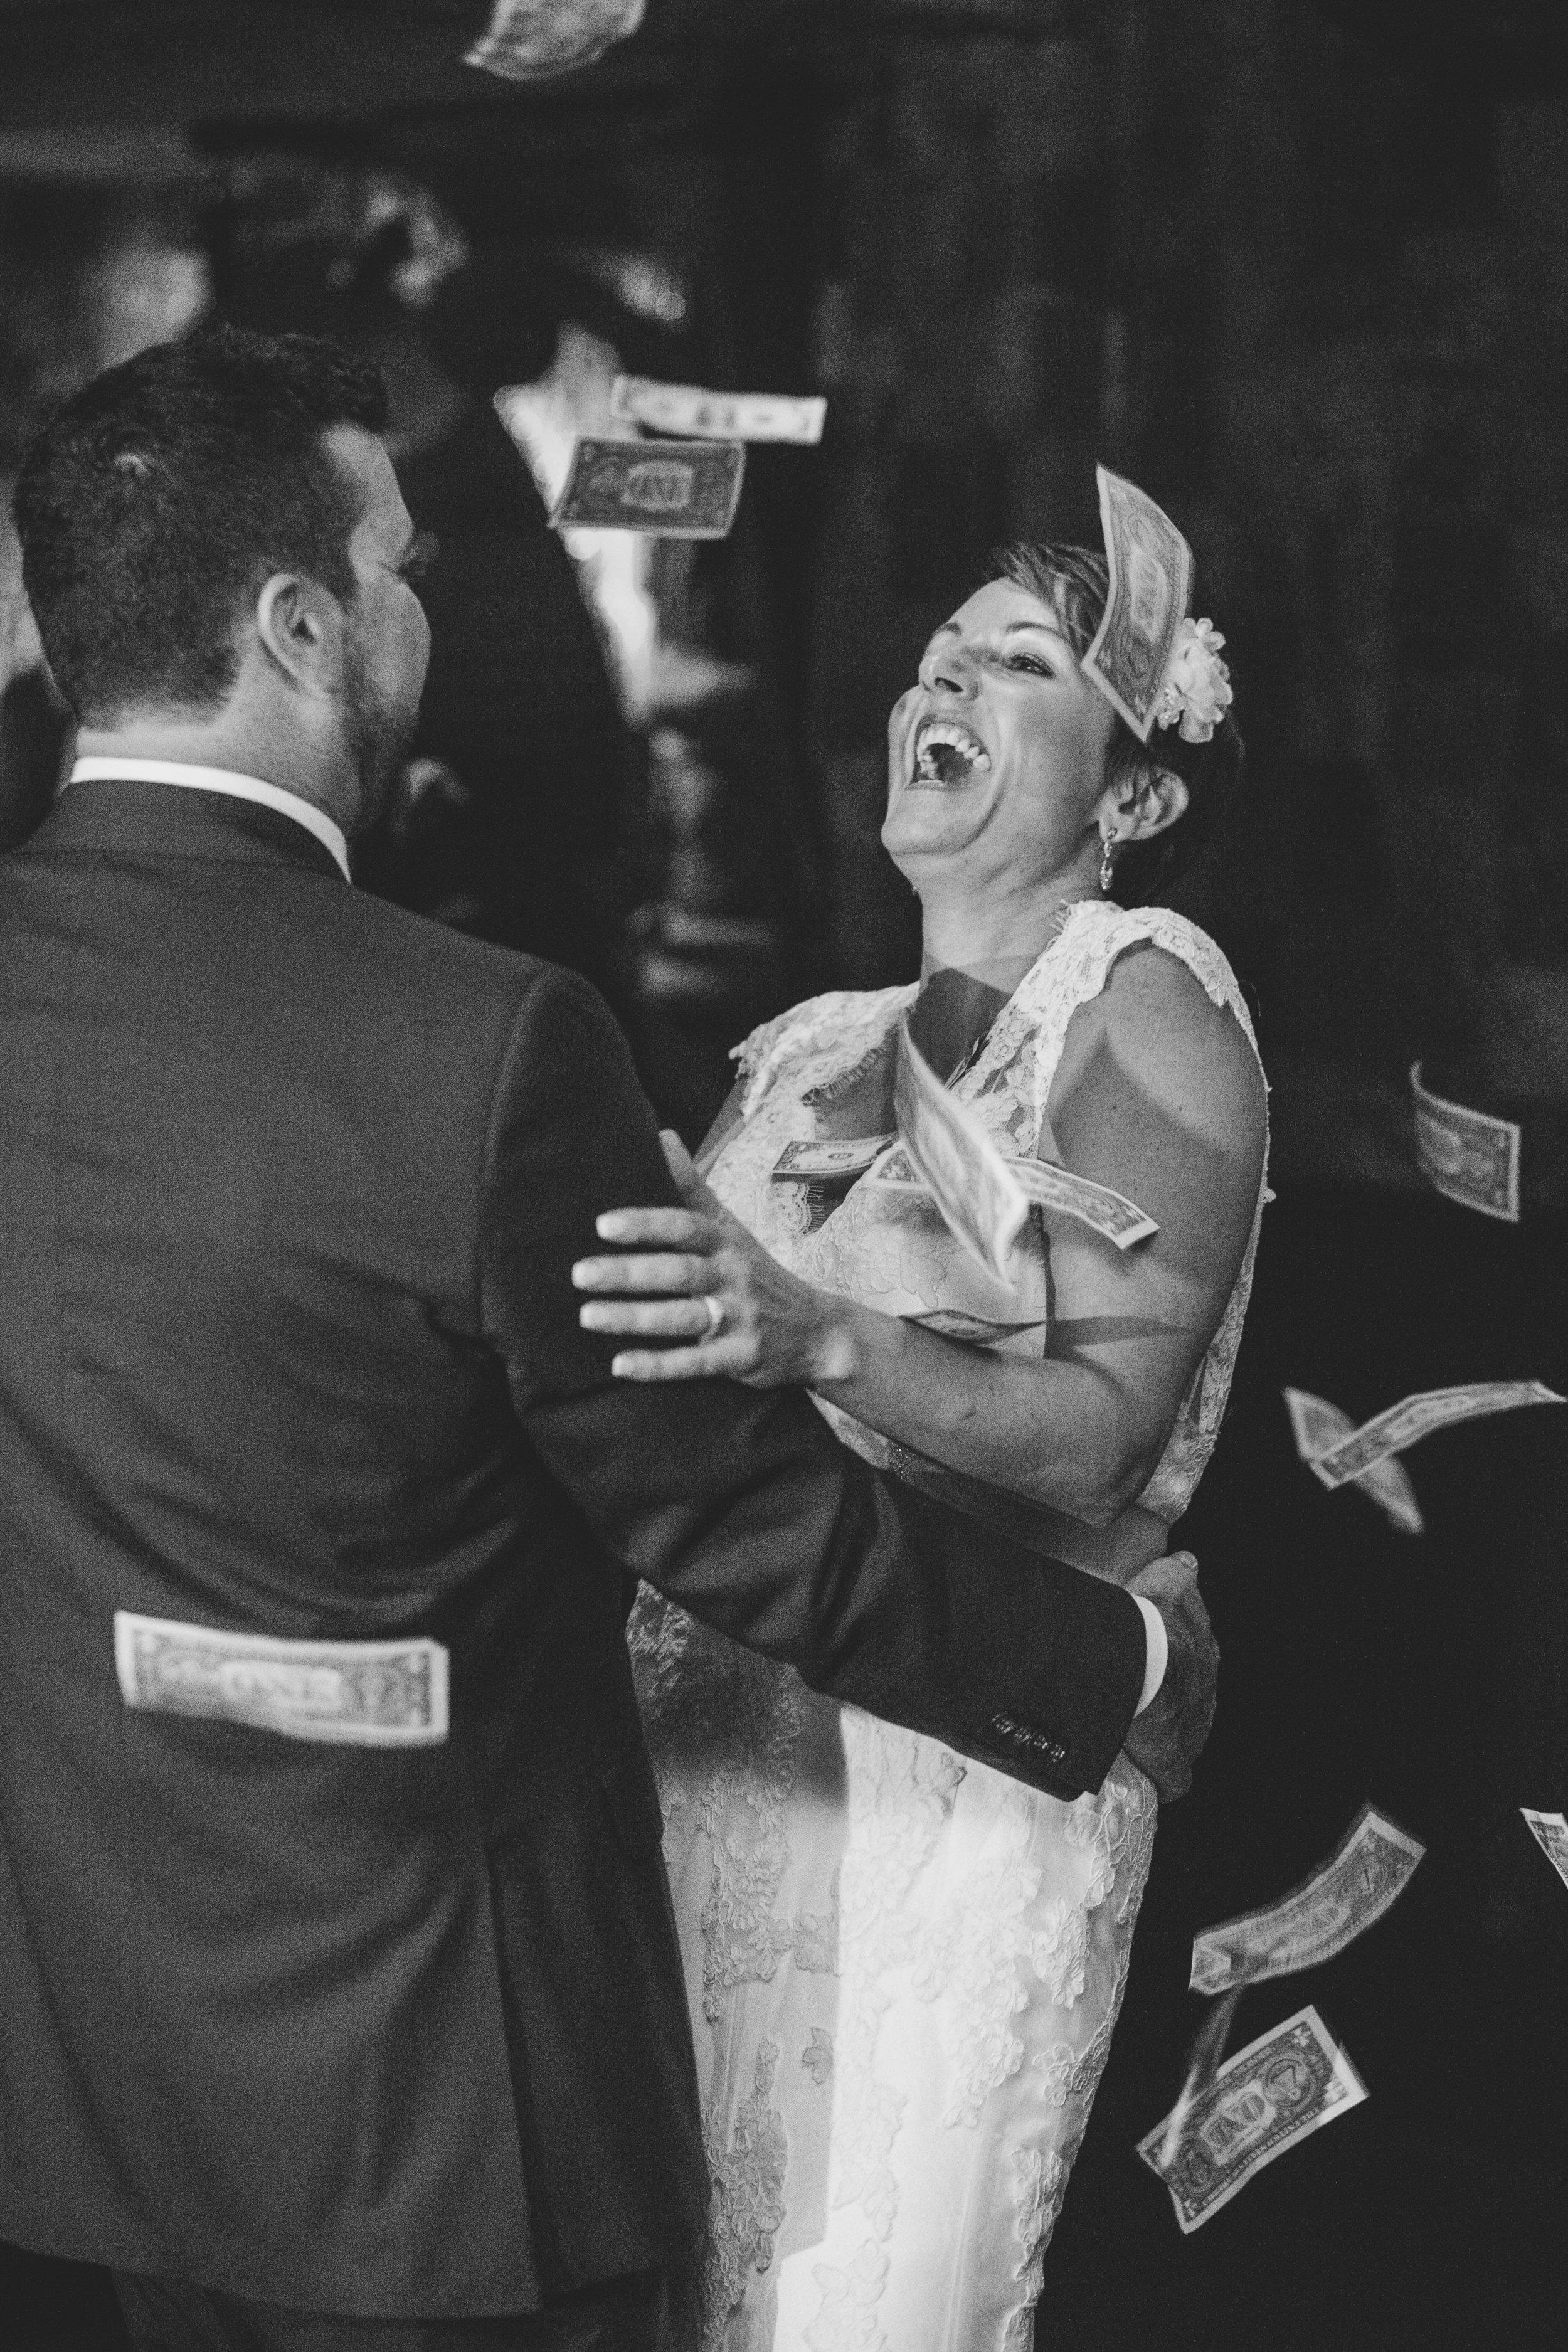 ATGI_Kat and Gabe Wedding 2016_2S8A5942.jpg